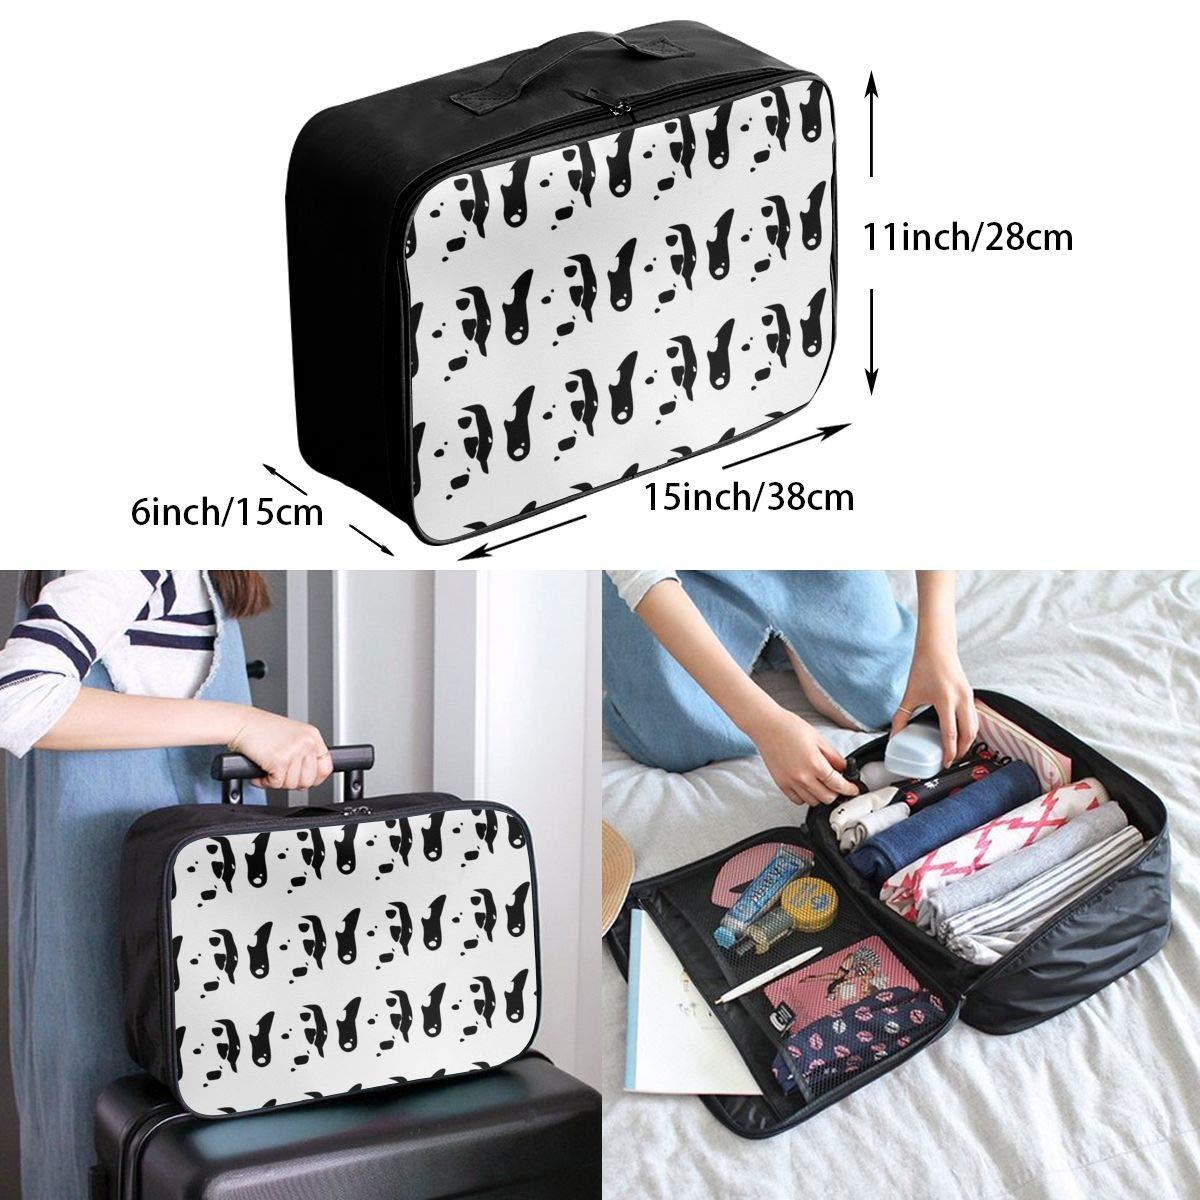 Travel Duffel Bag Waterproof Fashion Lightweight Large Capacity Portable Luggage Bag Dalmatian